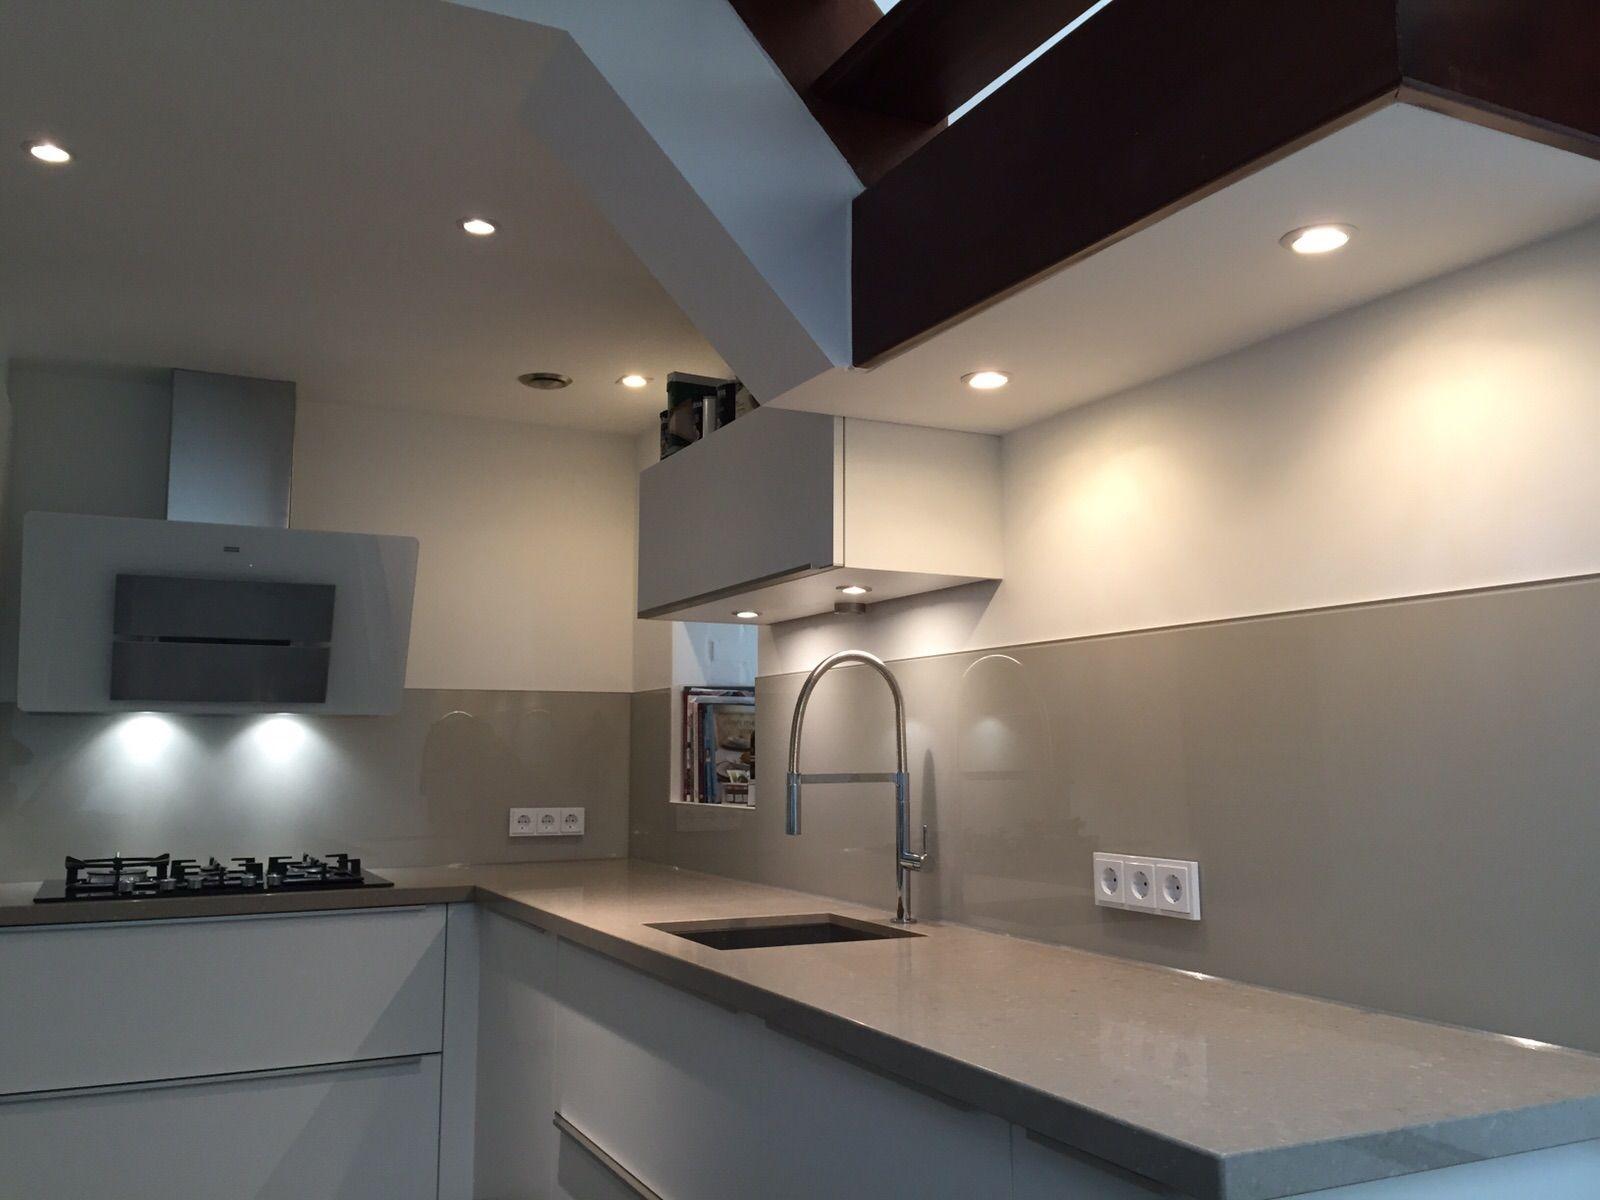 Zand kleur glazen achterwand keukenglas spatwand keuken glas kitcheninspiration - Open keukenglas ...